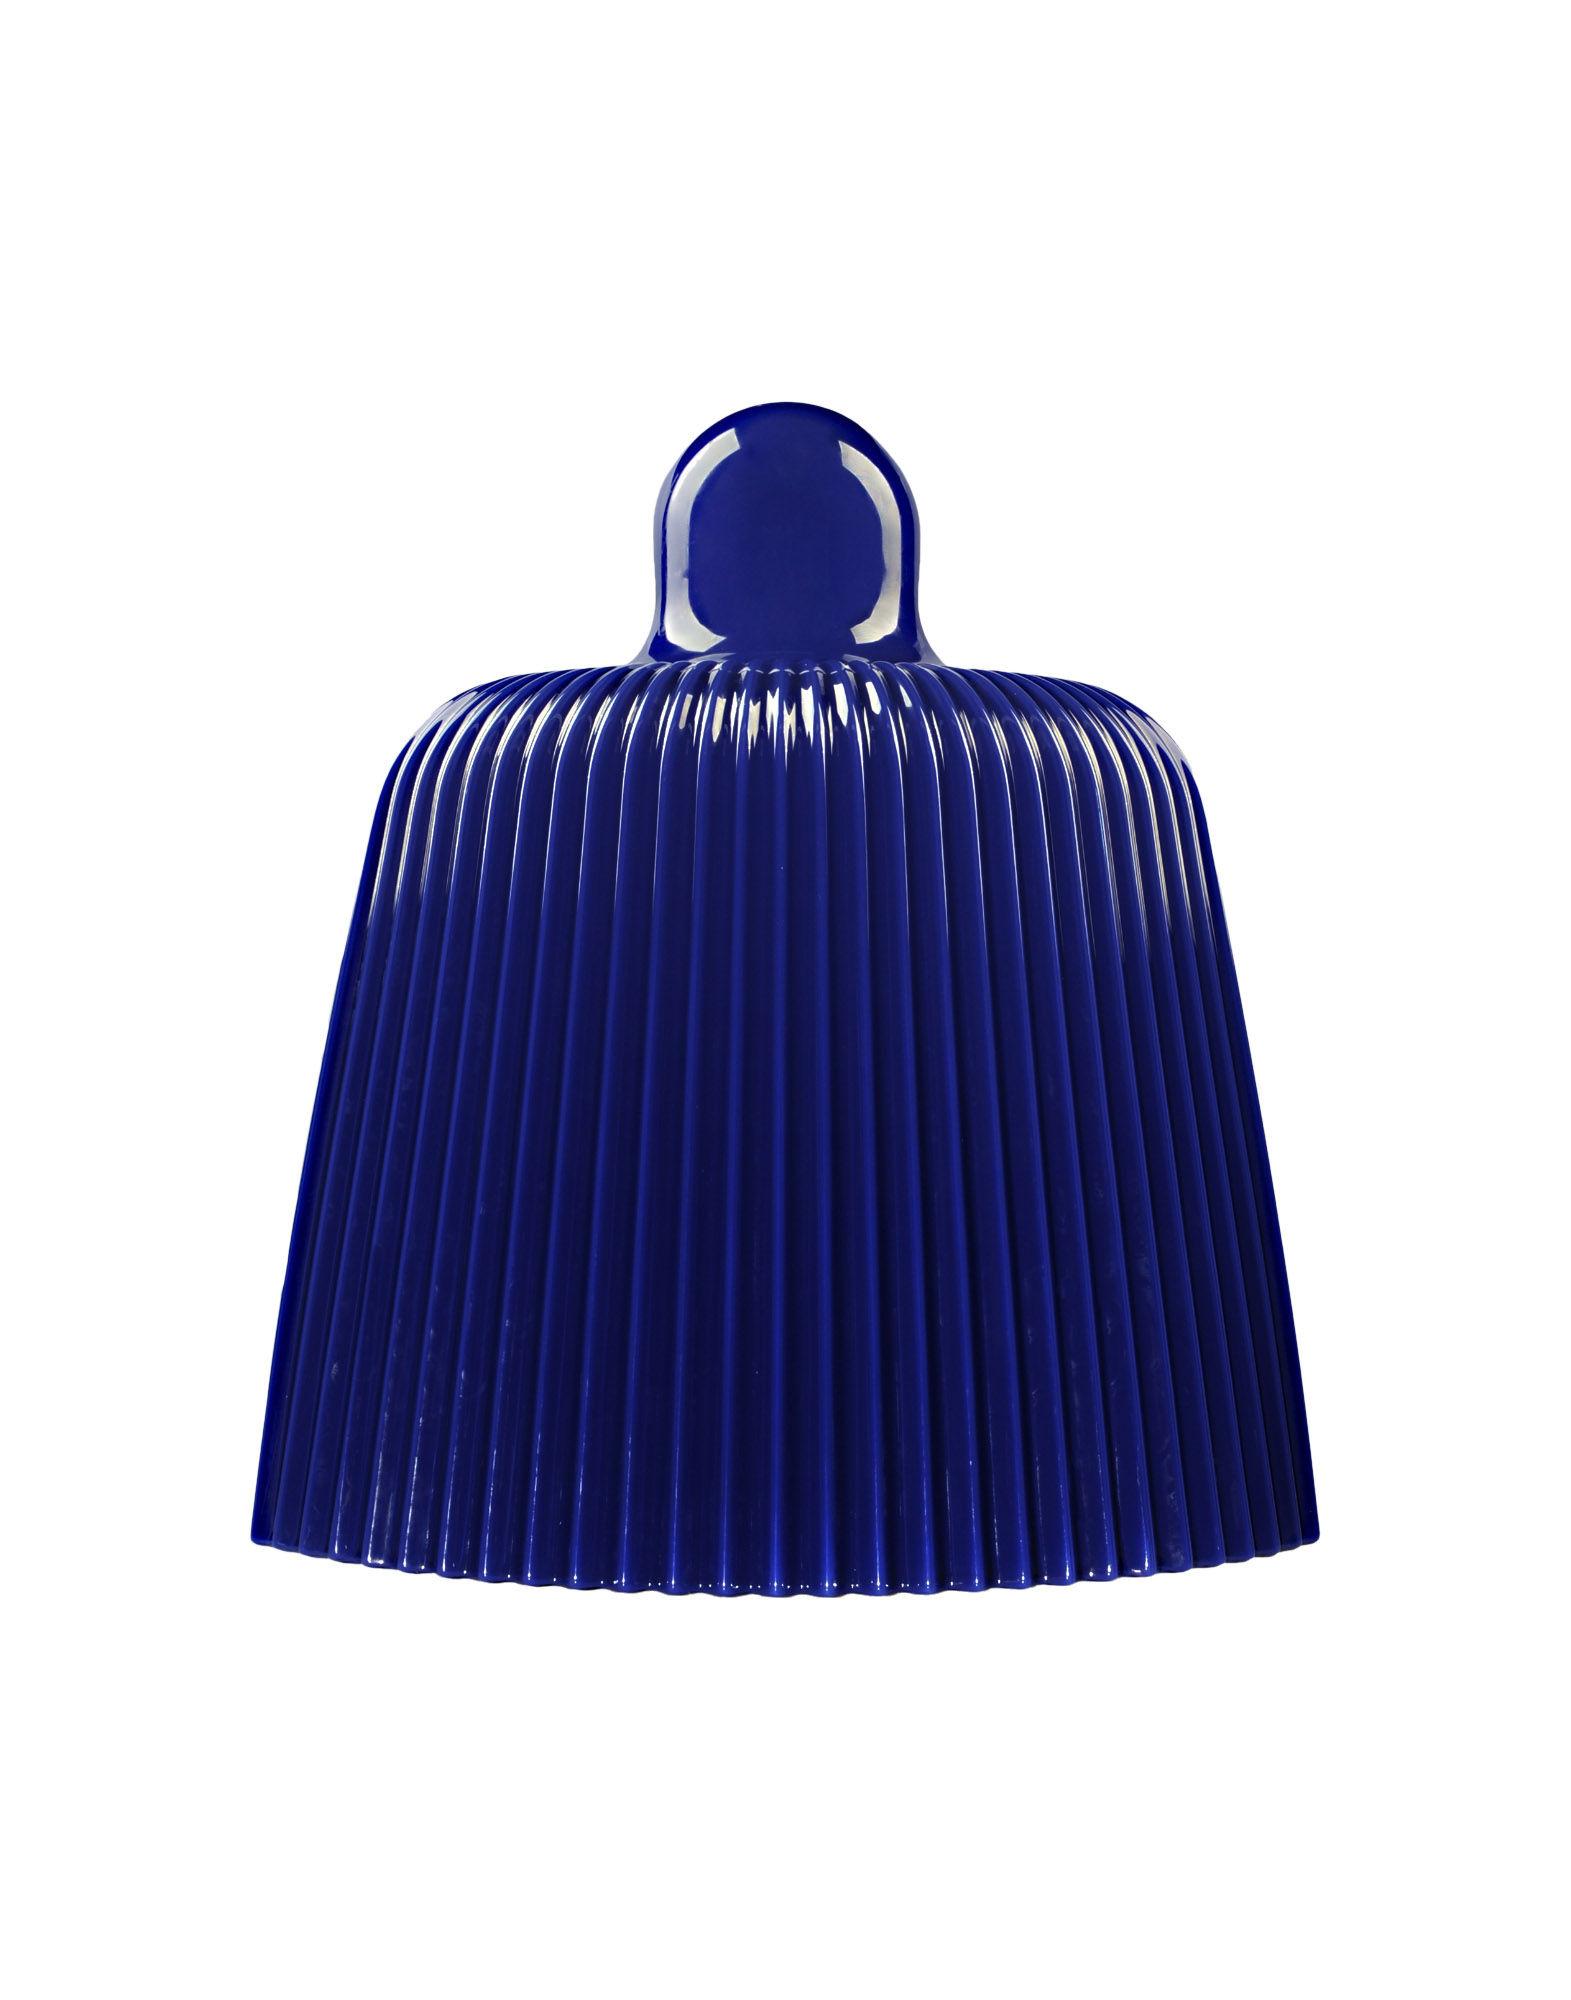 PALLUCCO Настенная лампа акита настенная вешалка 52х23 см лаванда aki 314 11